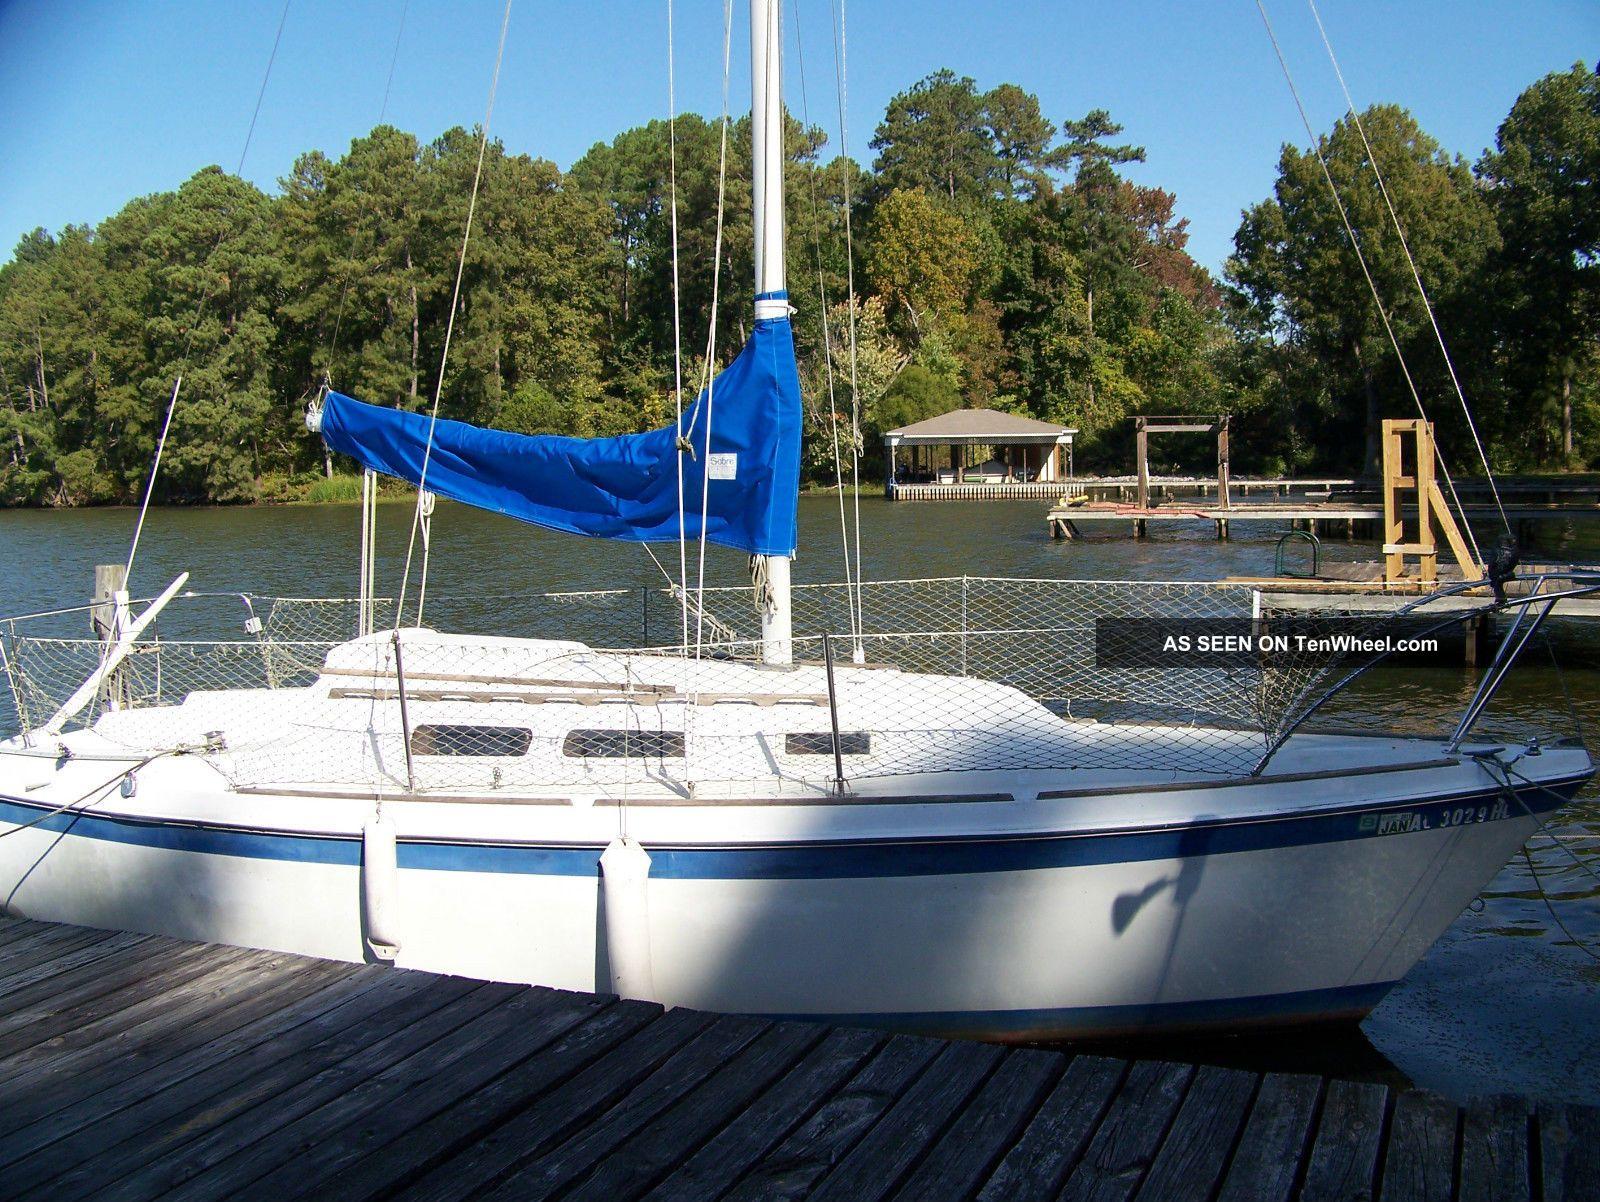 1978 O ' Day Sailboats 20-27 feet photo